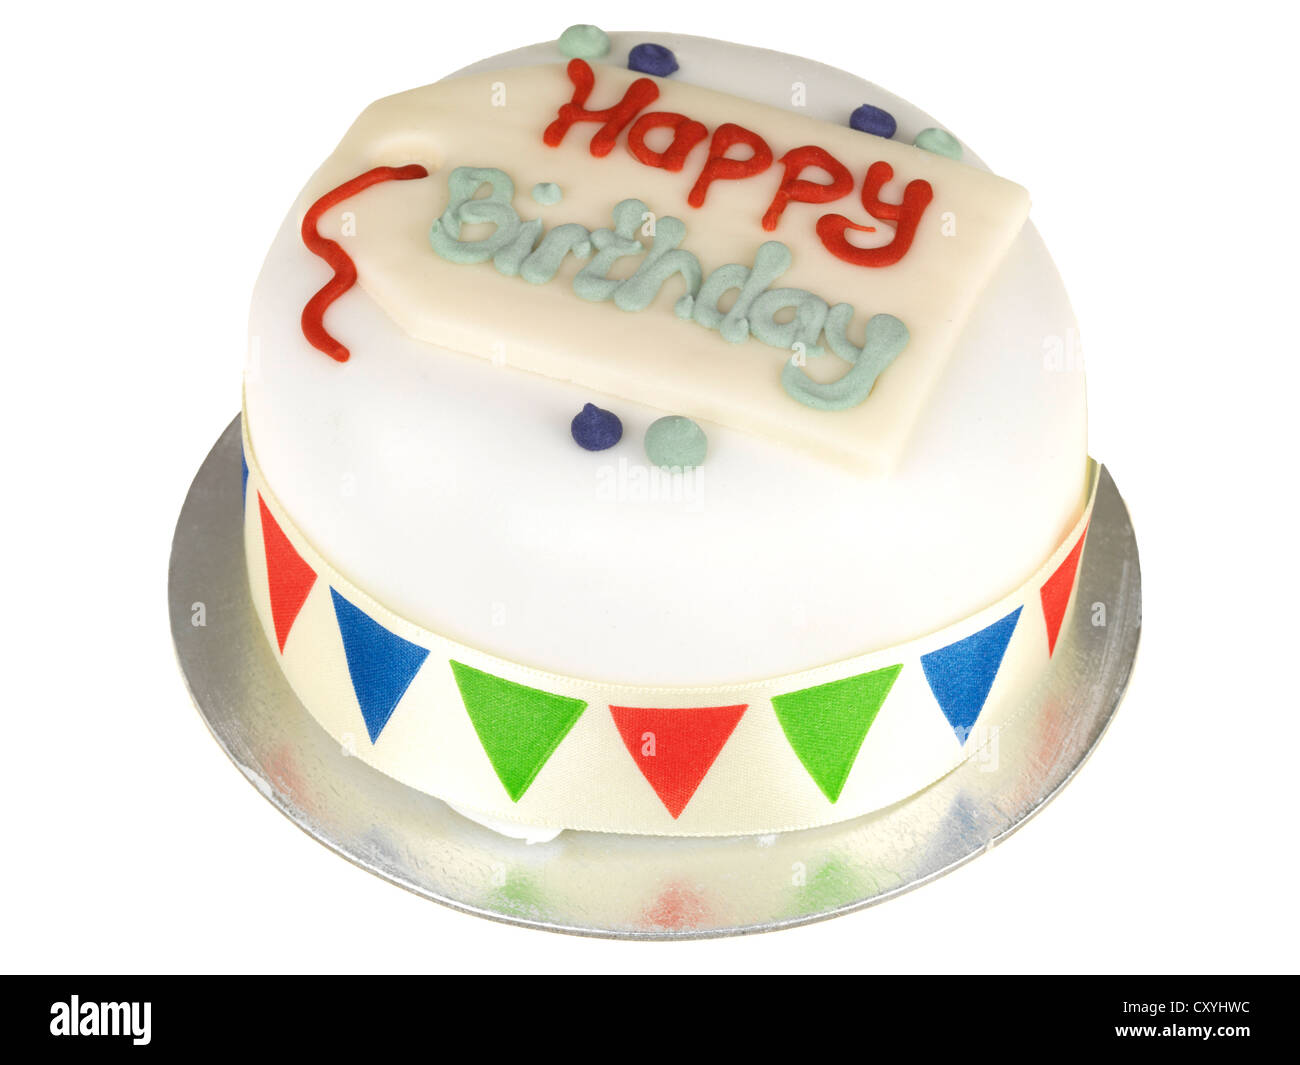 Happy Birthday Cake Stock Photo 51008536